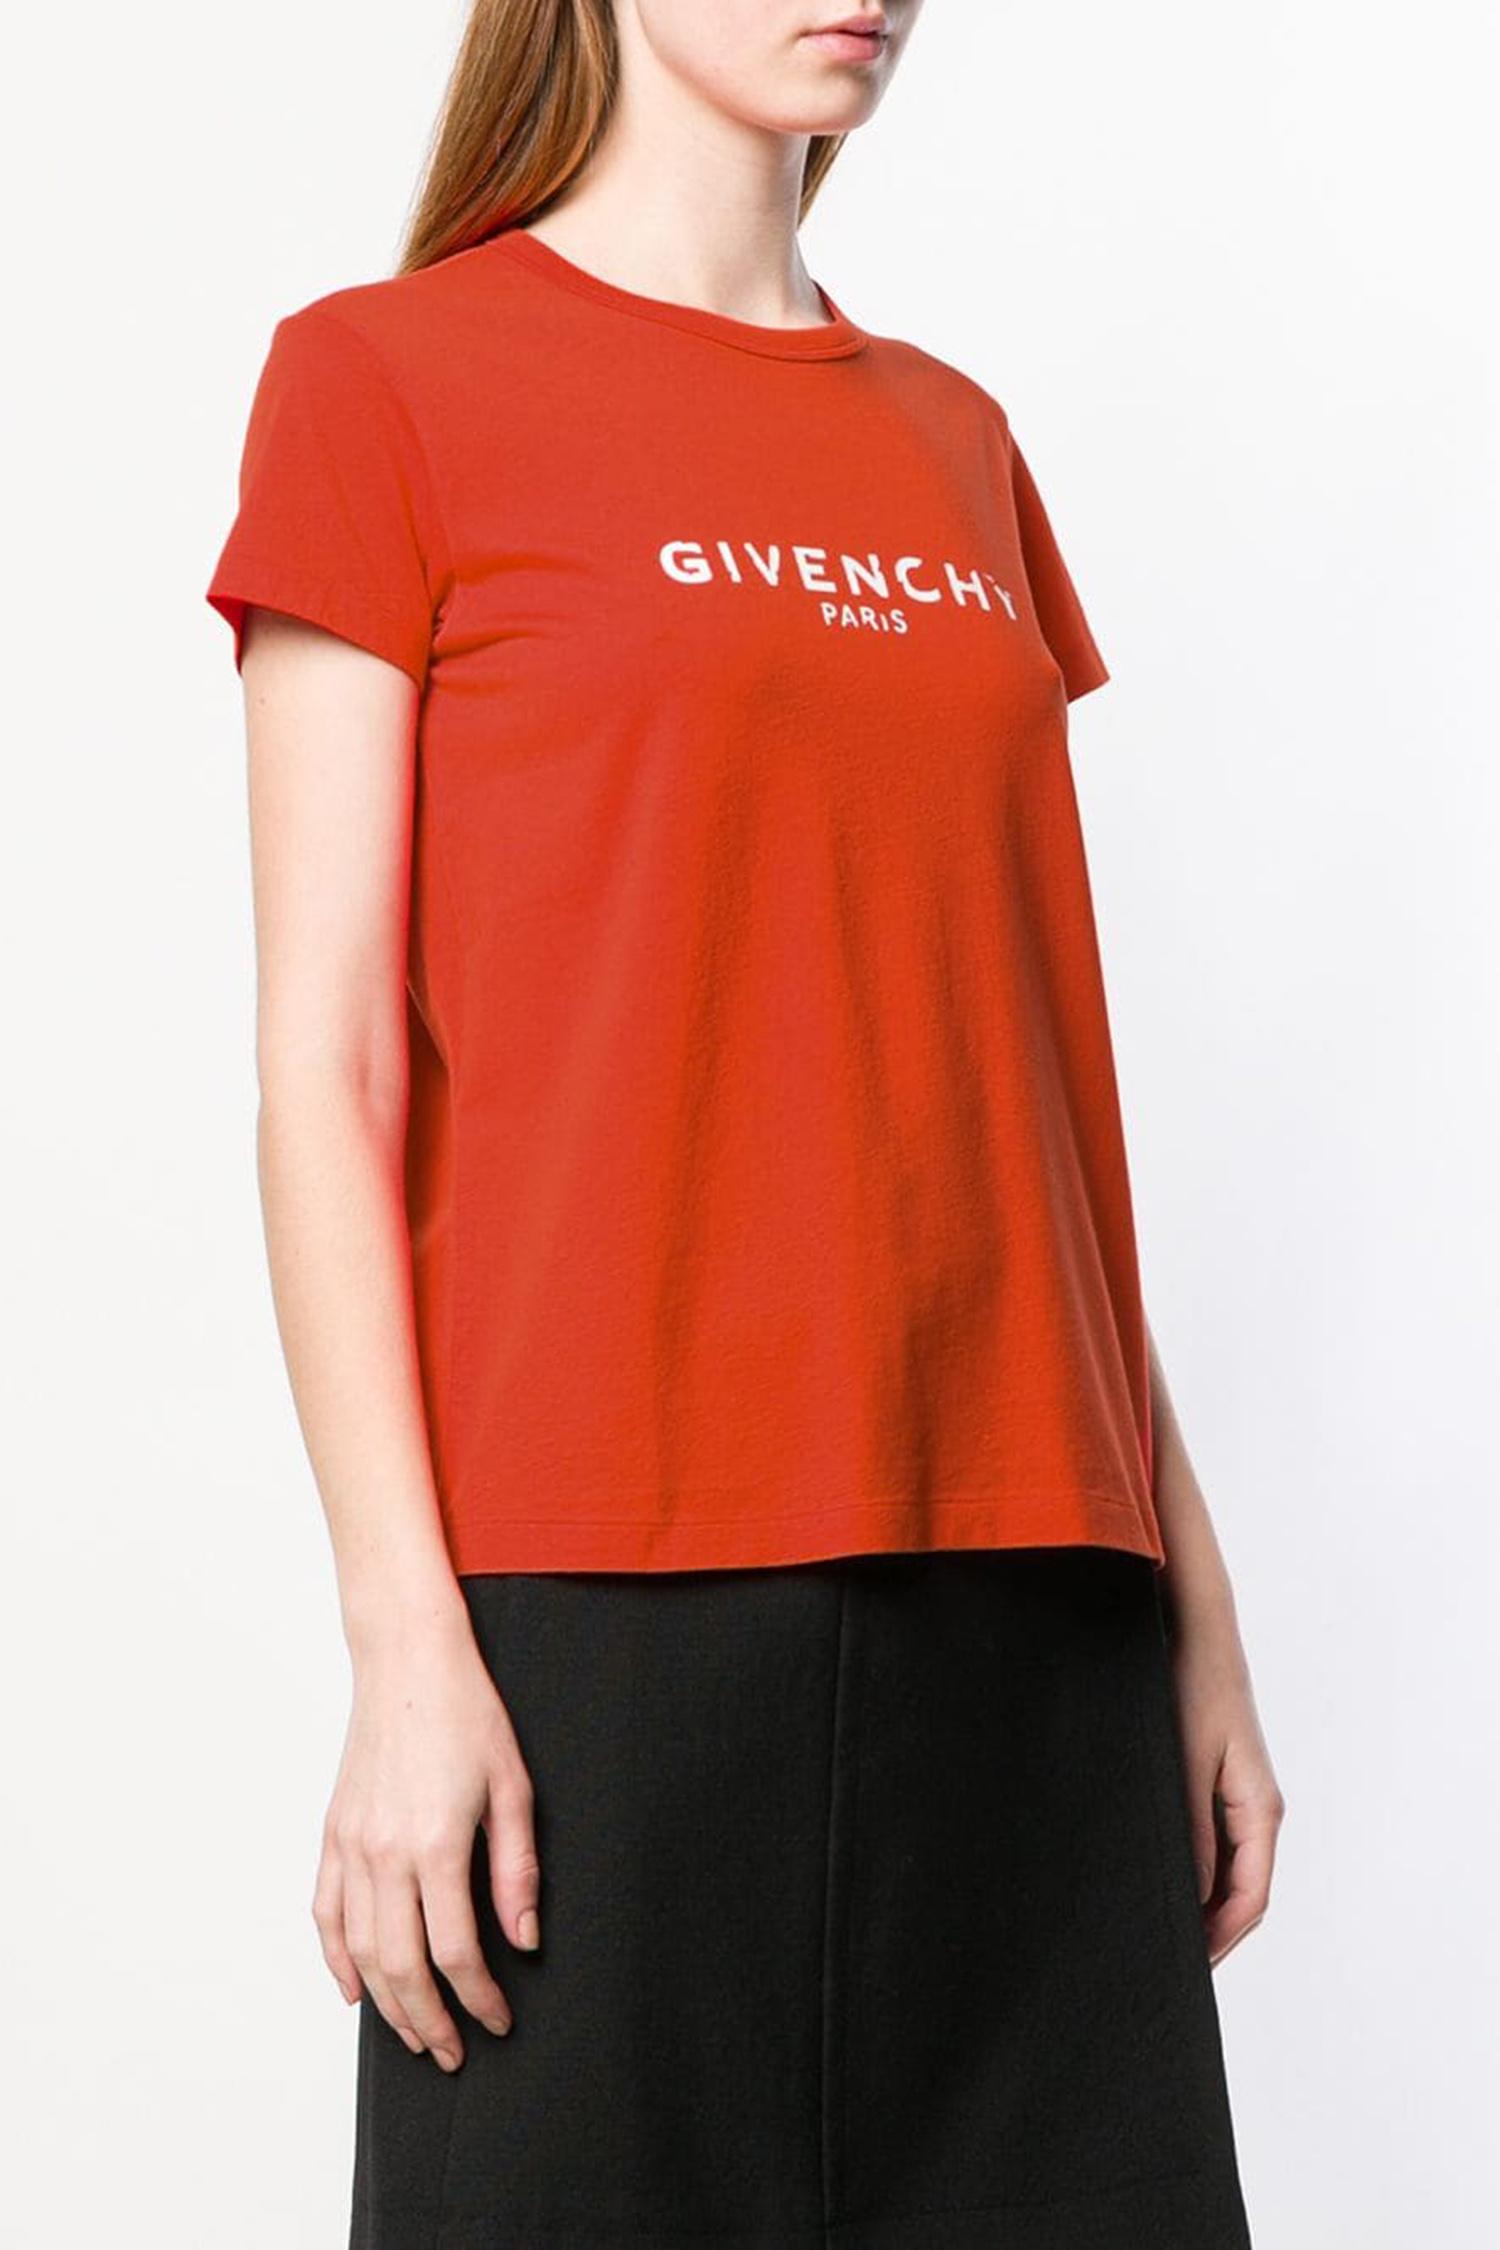 d76c17dcc32 ... GIVENCHY Приталенная футболка с логотипом ...